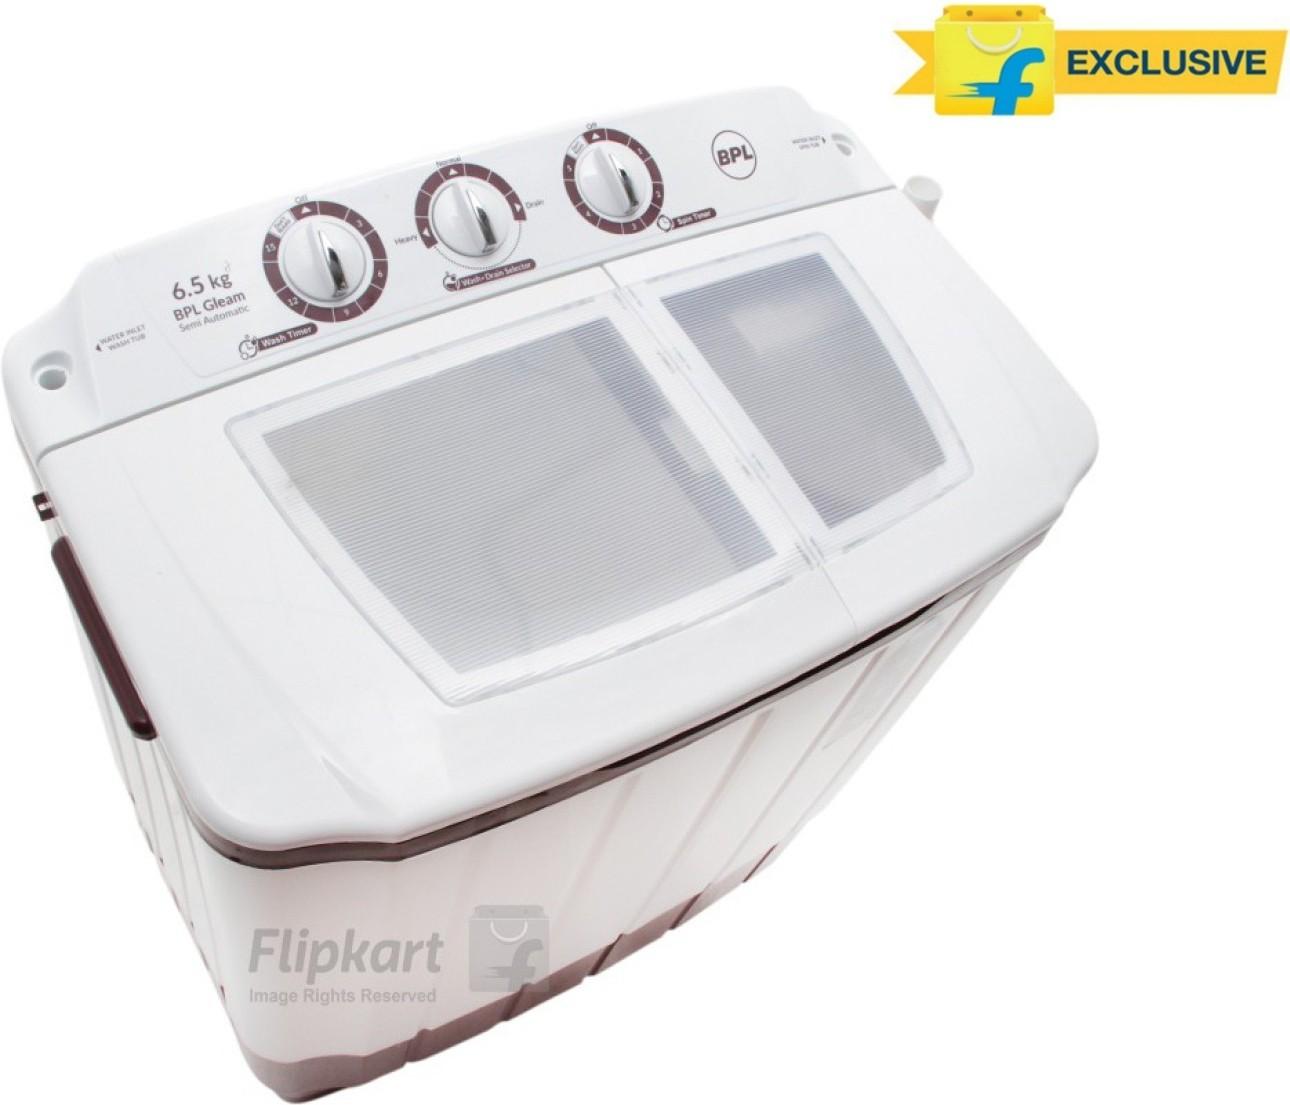 Deals | Just Rs.7,690 BPL 6.5 kg  Washing Machine